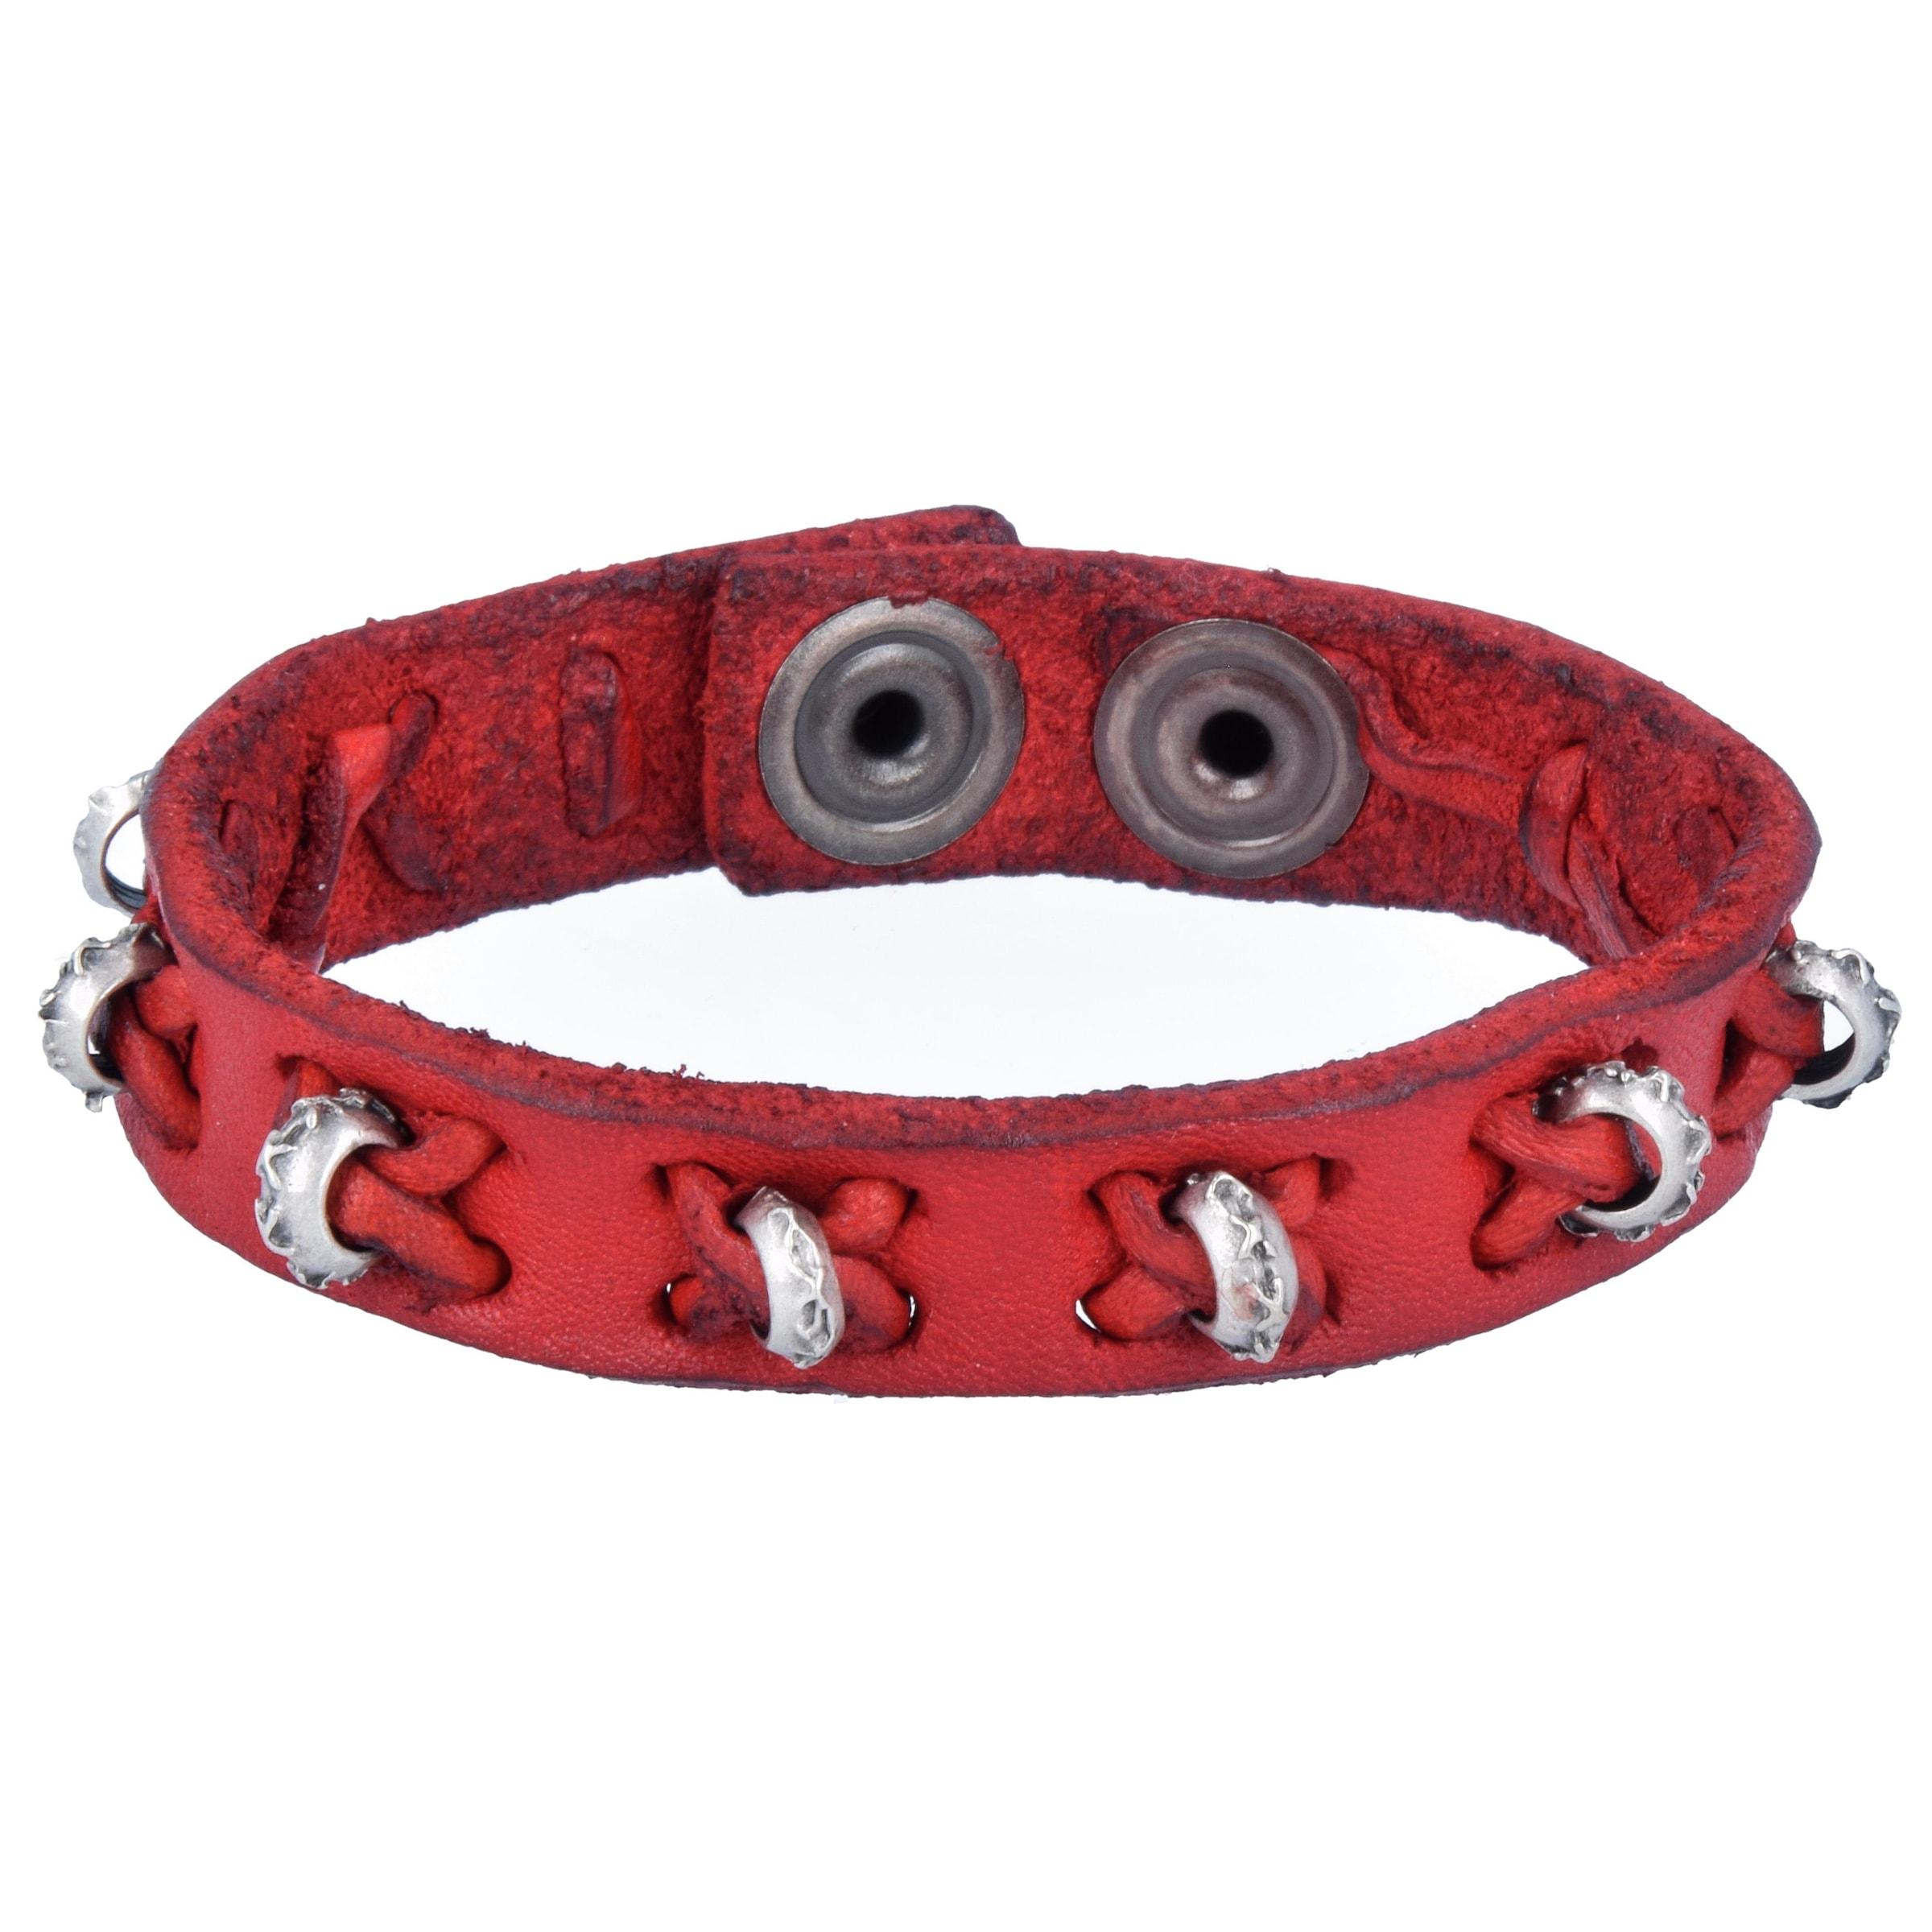 En Bracelet Bracelet RougeArgent En Campomaggi Campomaggi E9IDH2